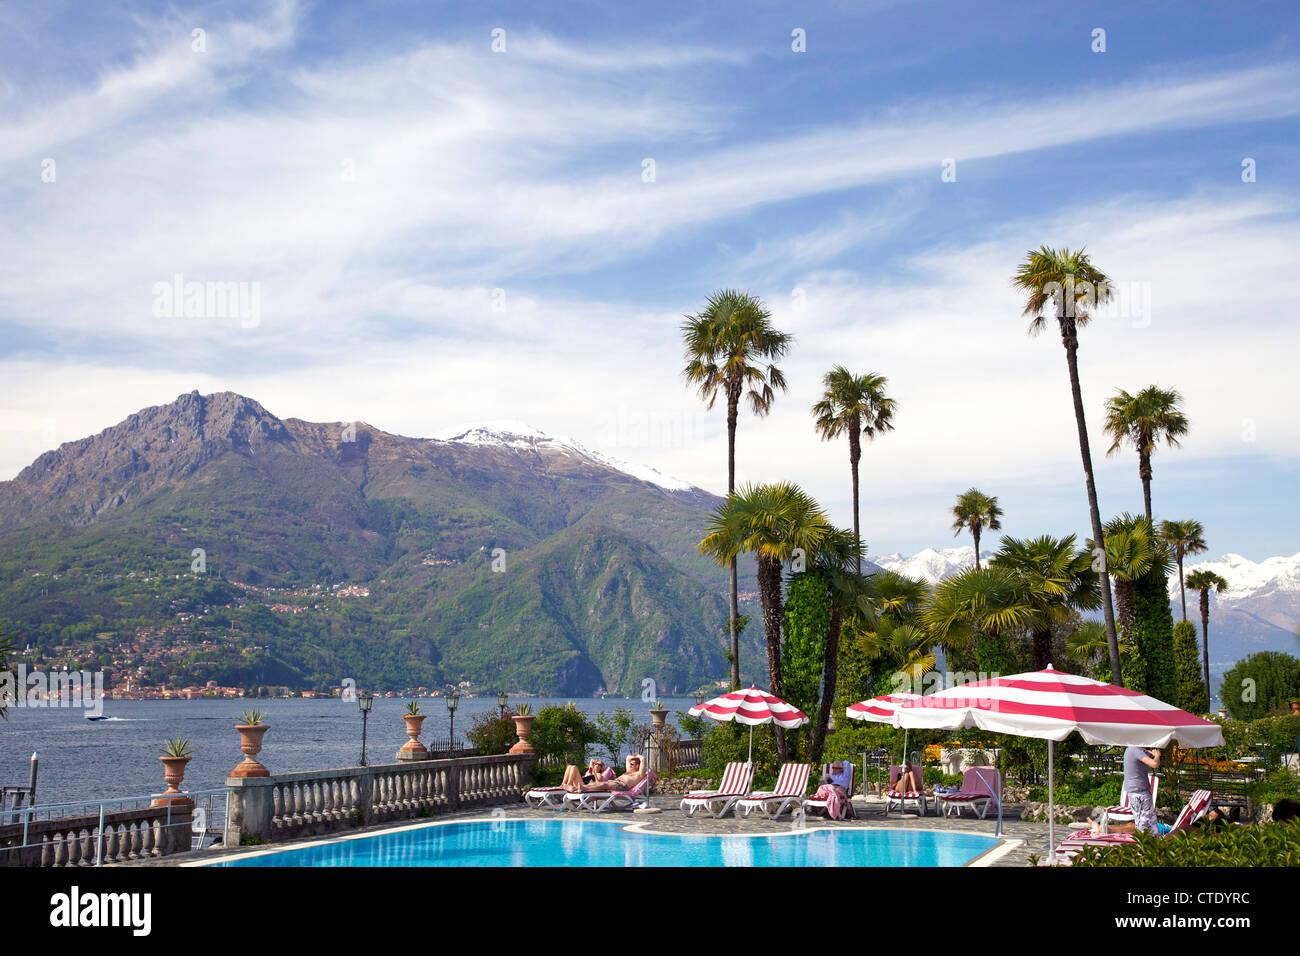 Grounds of Grand Hotel Villa Serbelloni, Bellagio, Lake Como, Northern Italy, Europe - Stock Image